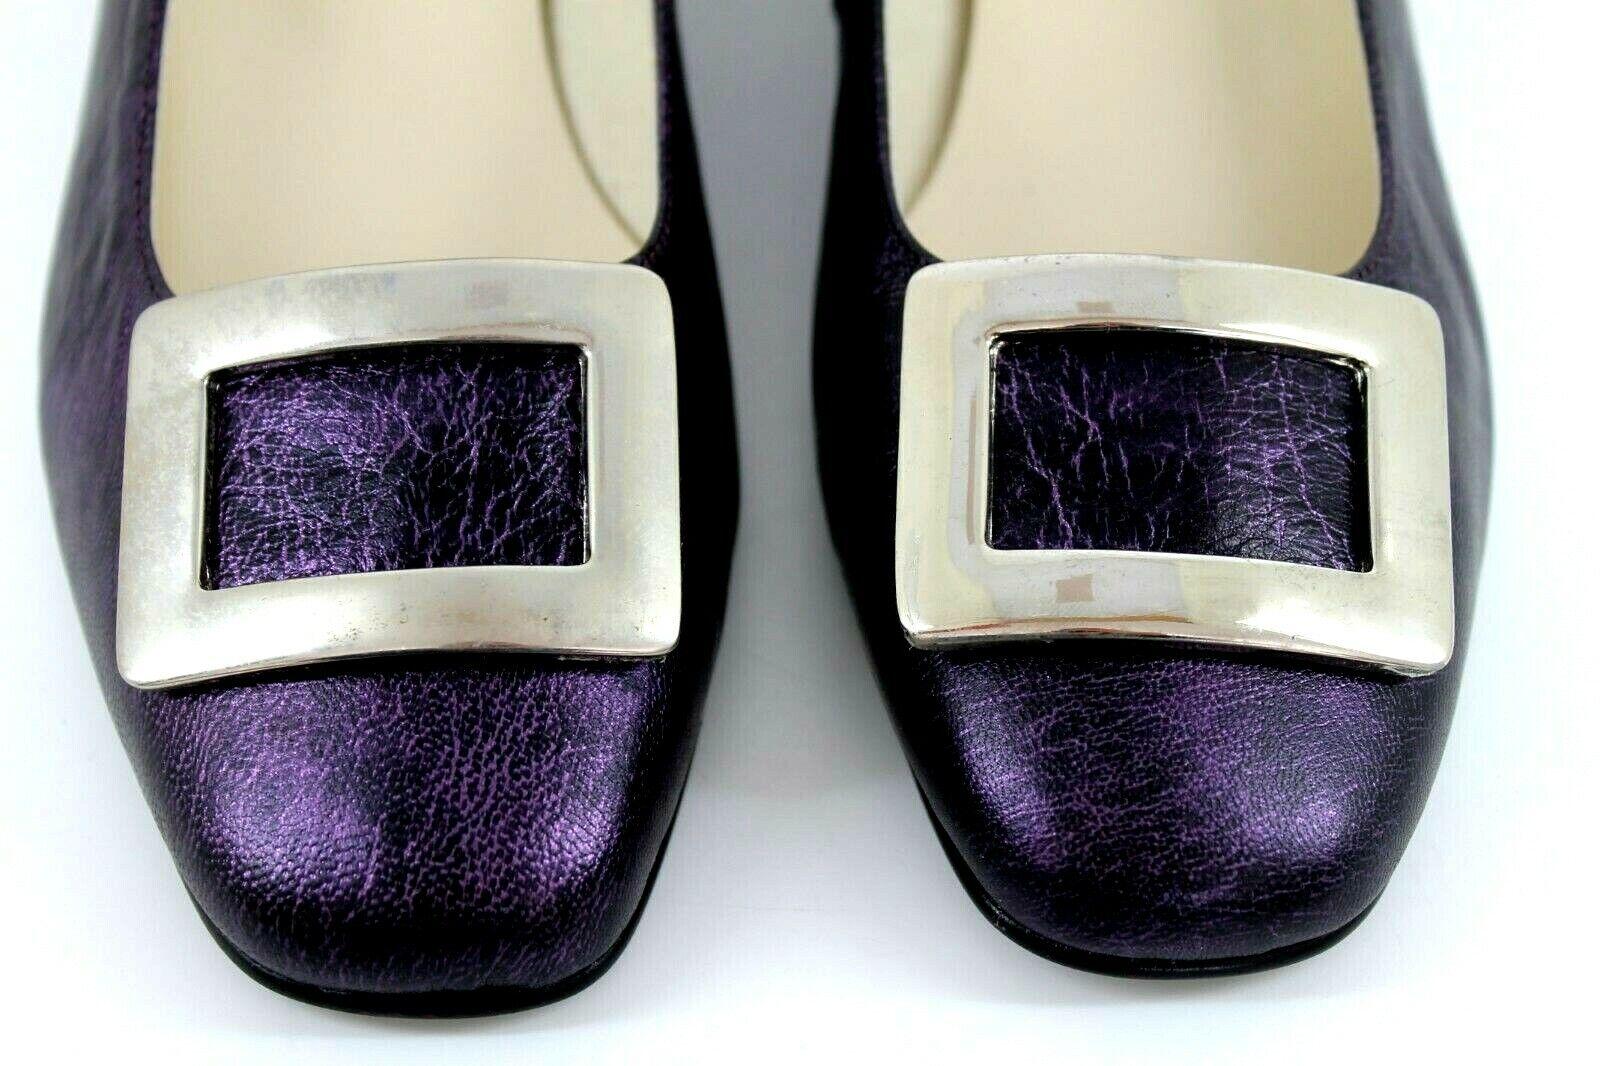 "Artigiano damen EU 41 UK 8 lila Leather Silber Silber Silber Décor 1.25"" Block Heel schuhe 6c21e0"